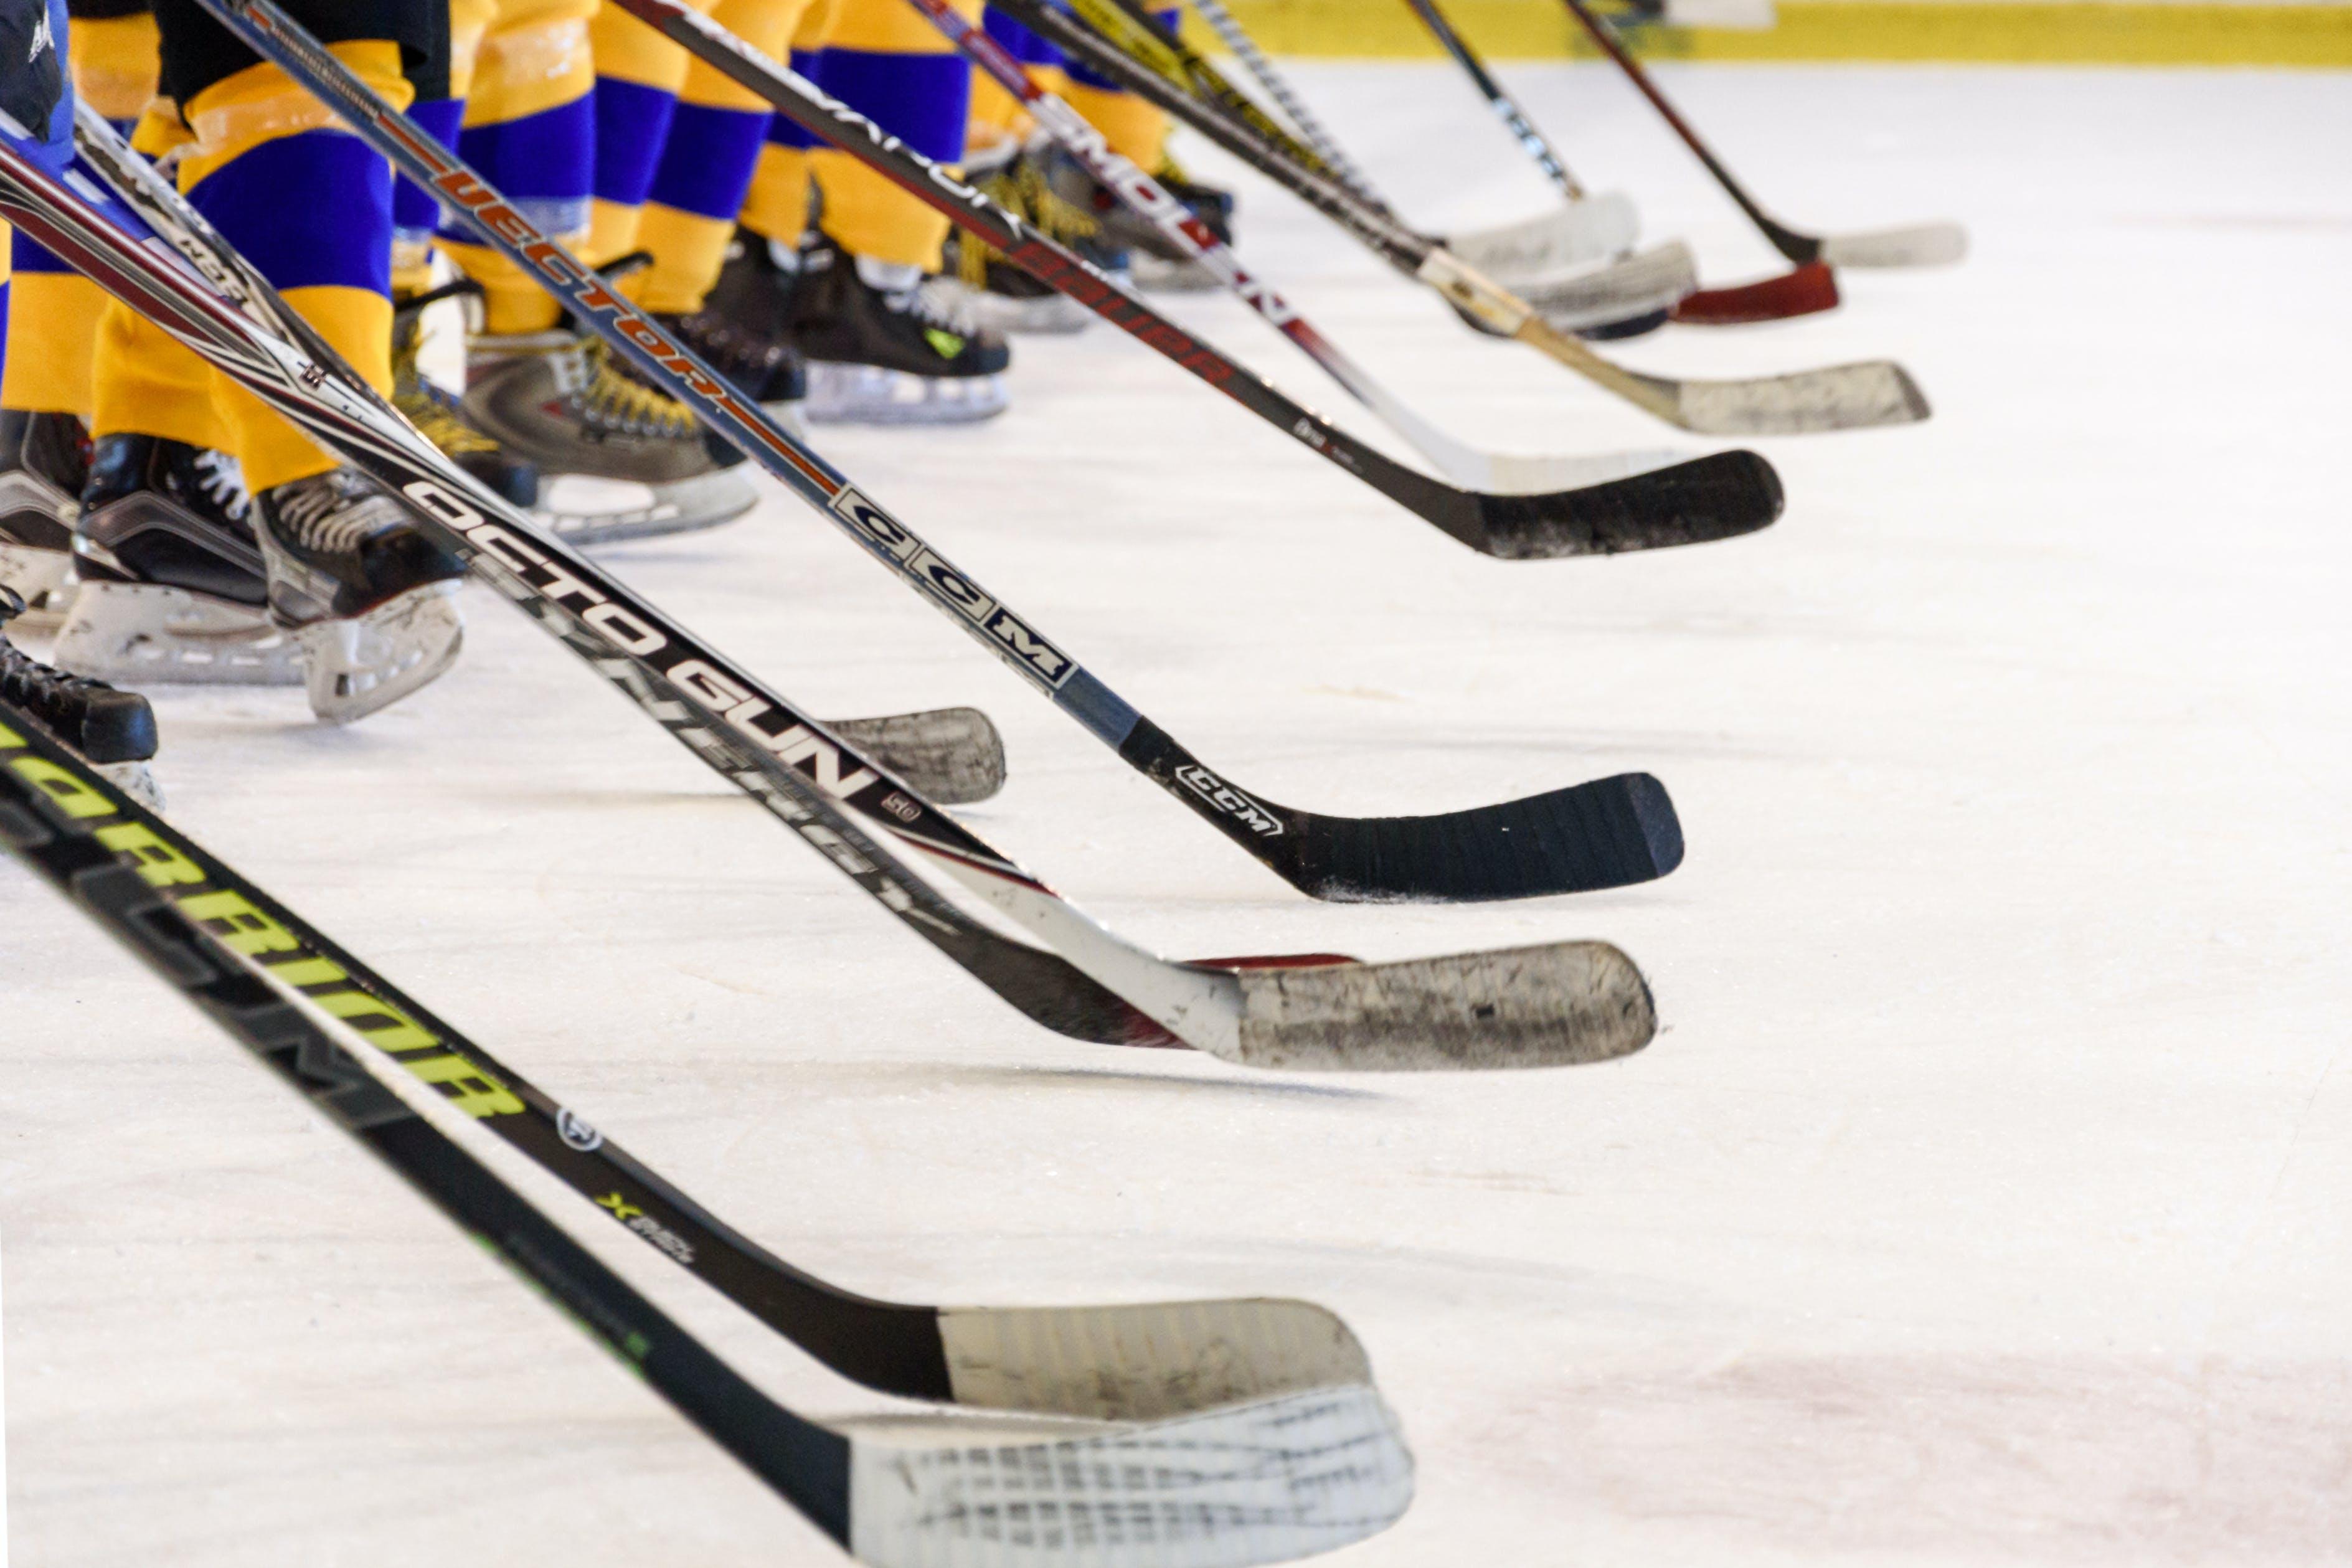 Black and White Hockey Sticks